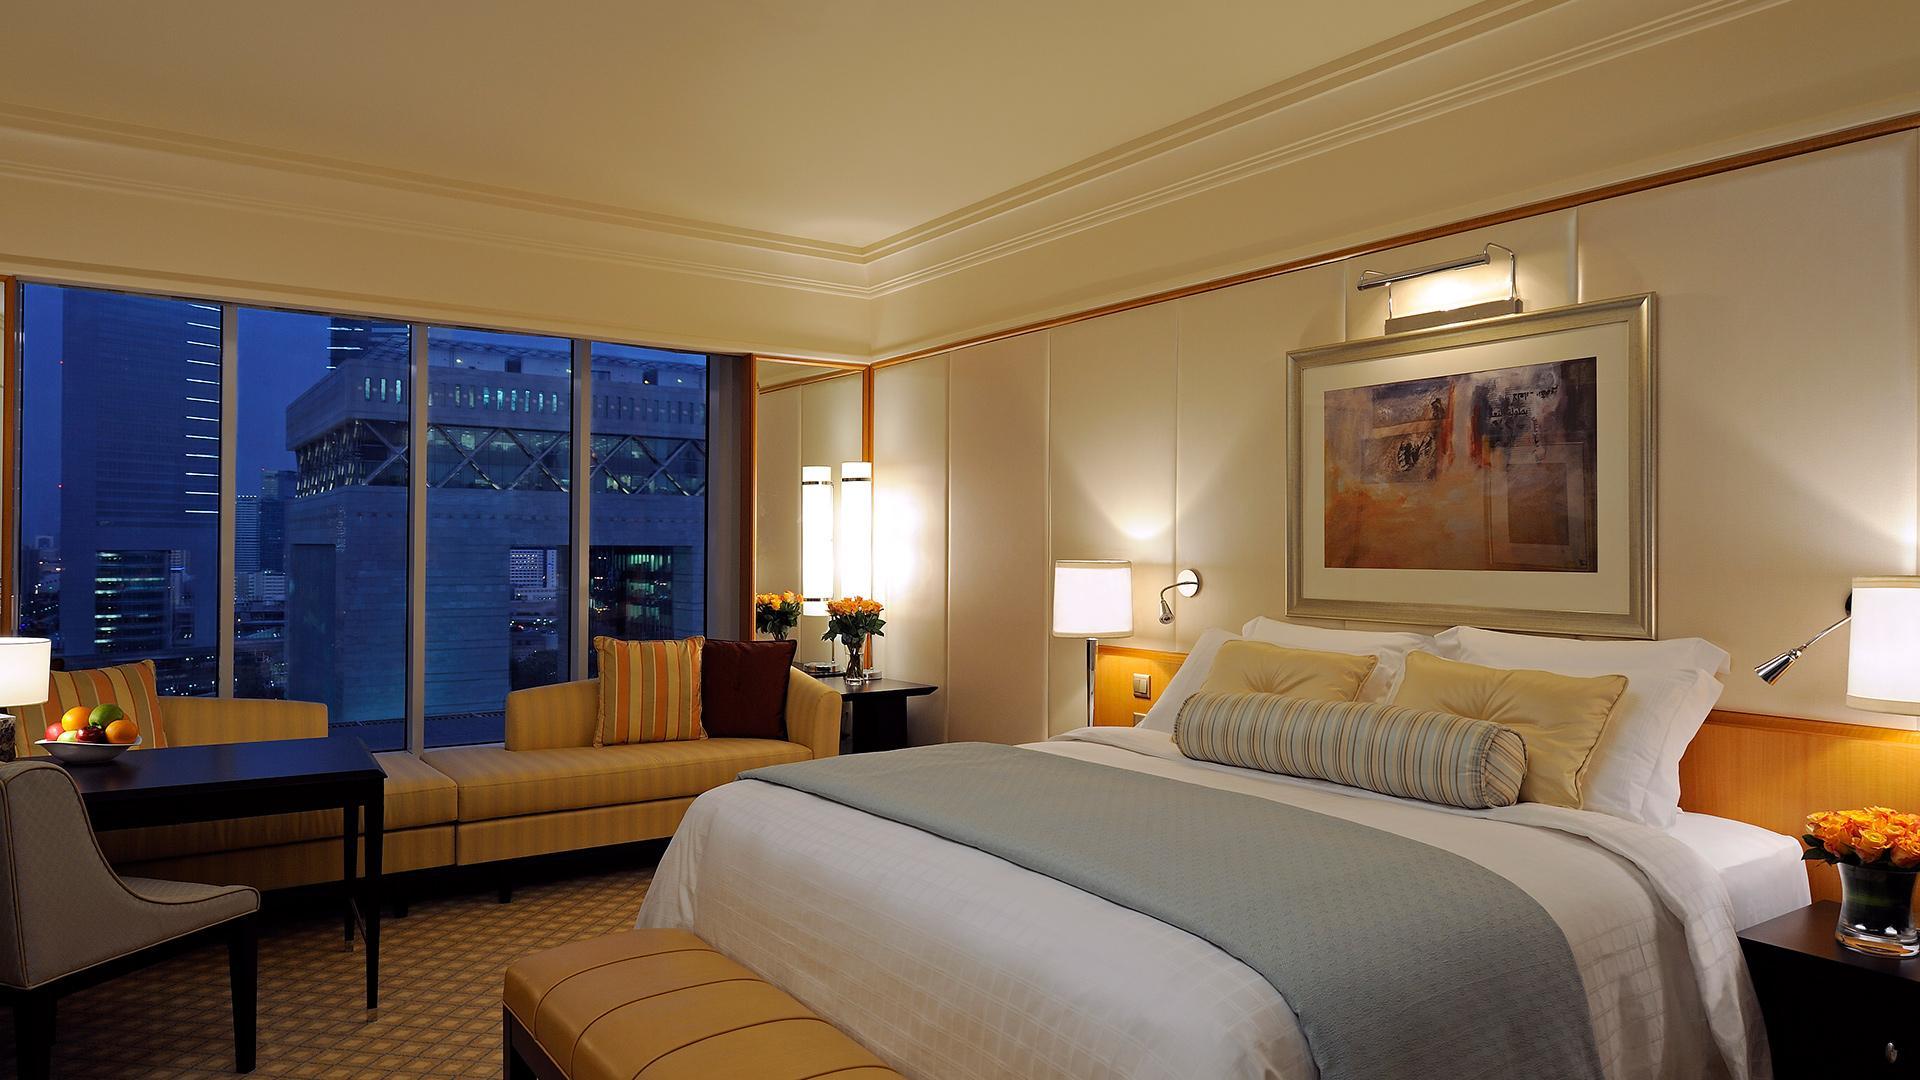 Premier Room image 1 at The Ritz-Carlton, Dubai International Financial Centre by null, Dubai, United Arab Emirates